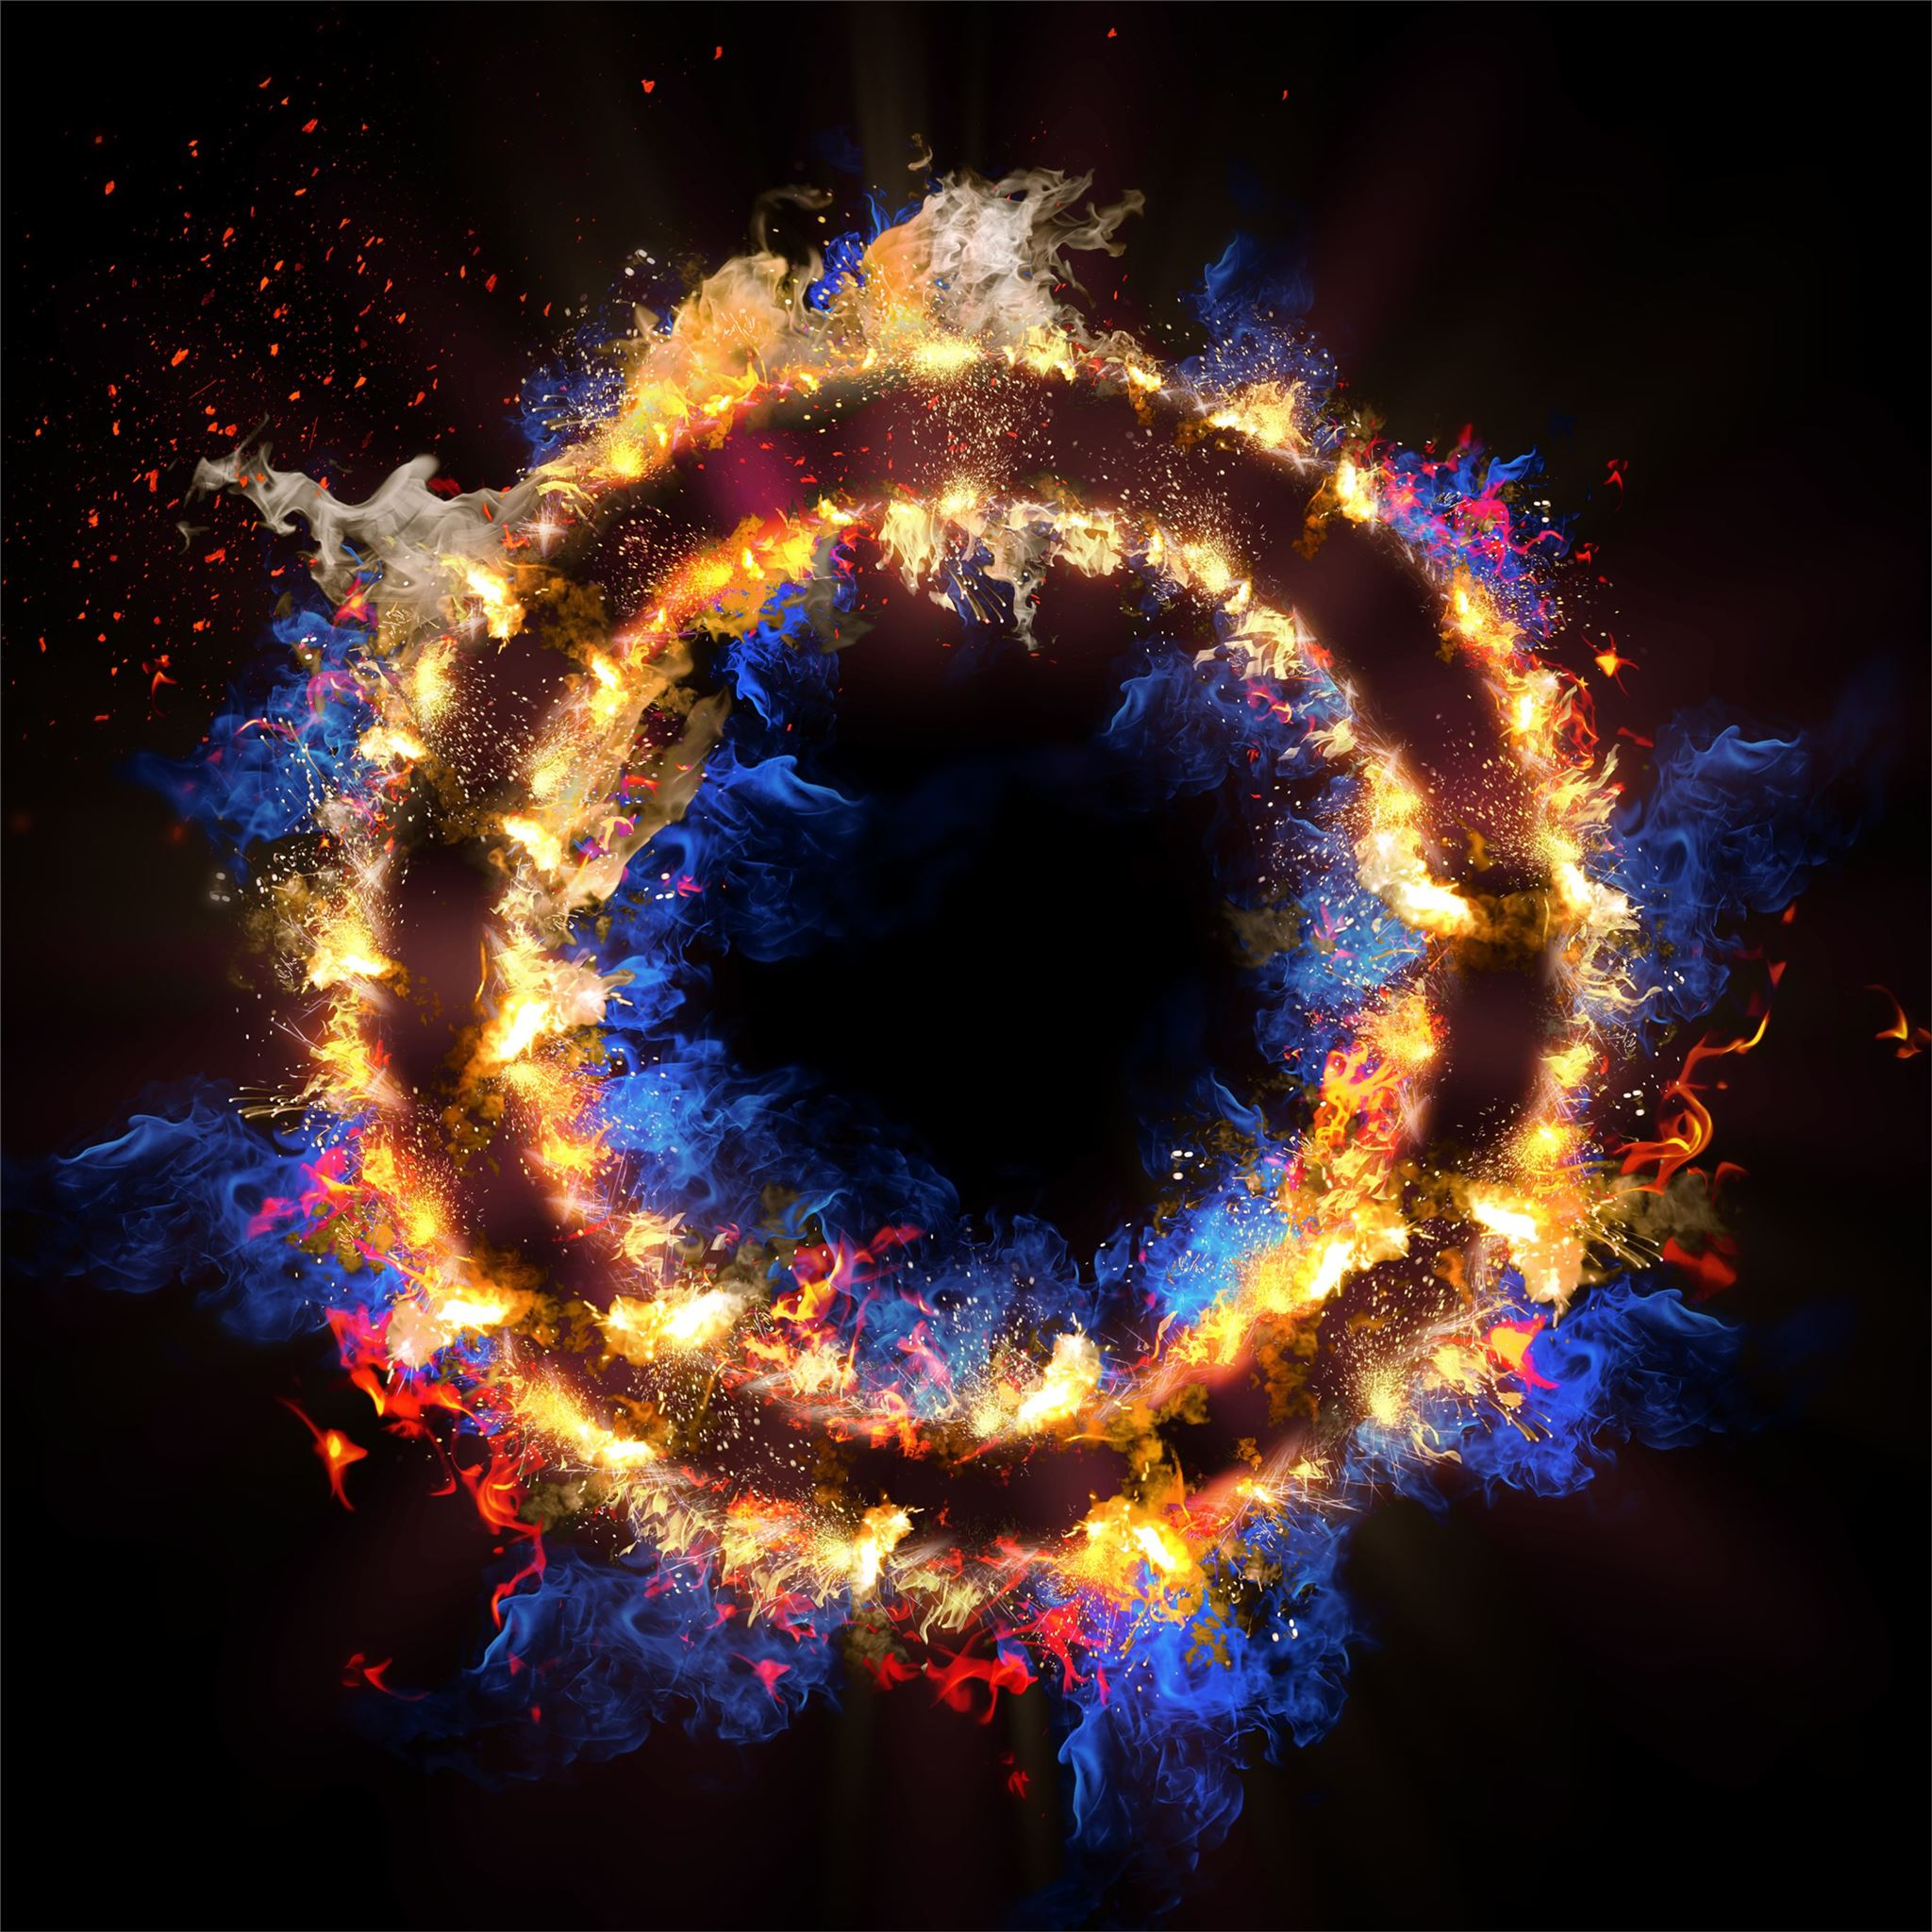 Flame Circle 3d Abstract 5k IPad Air Wallpapers Free Download